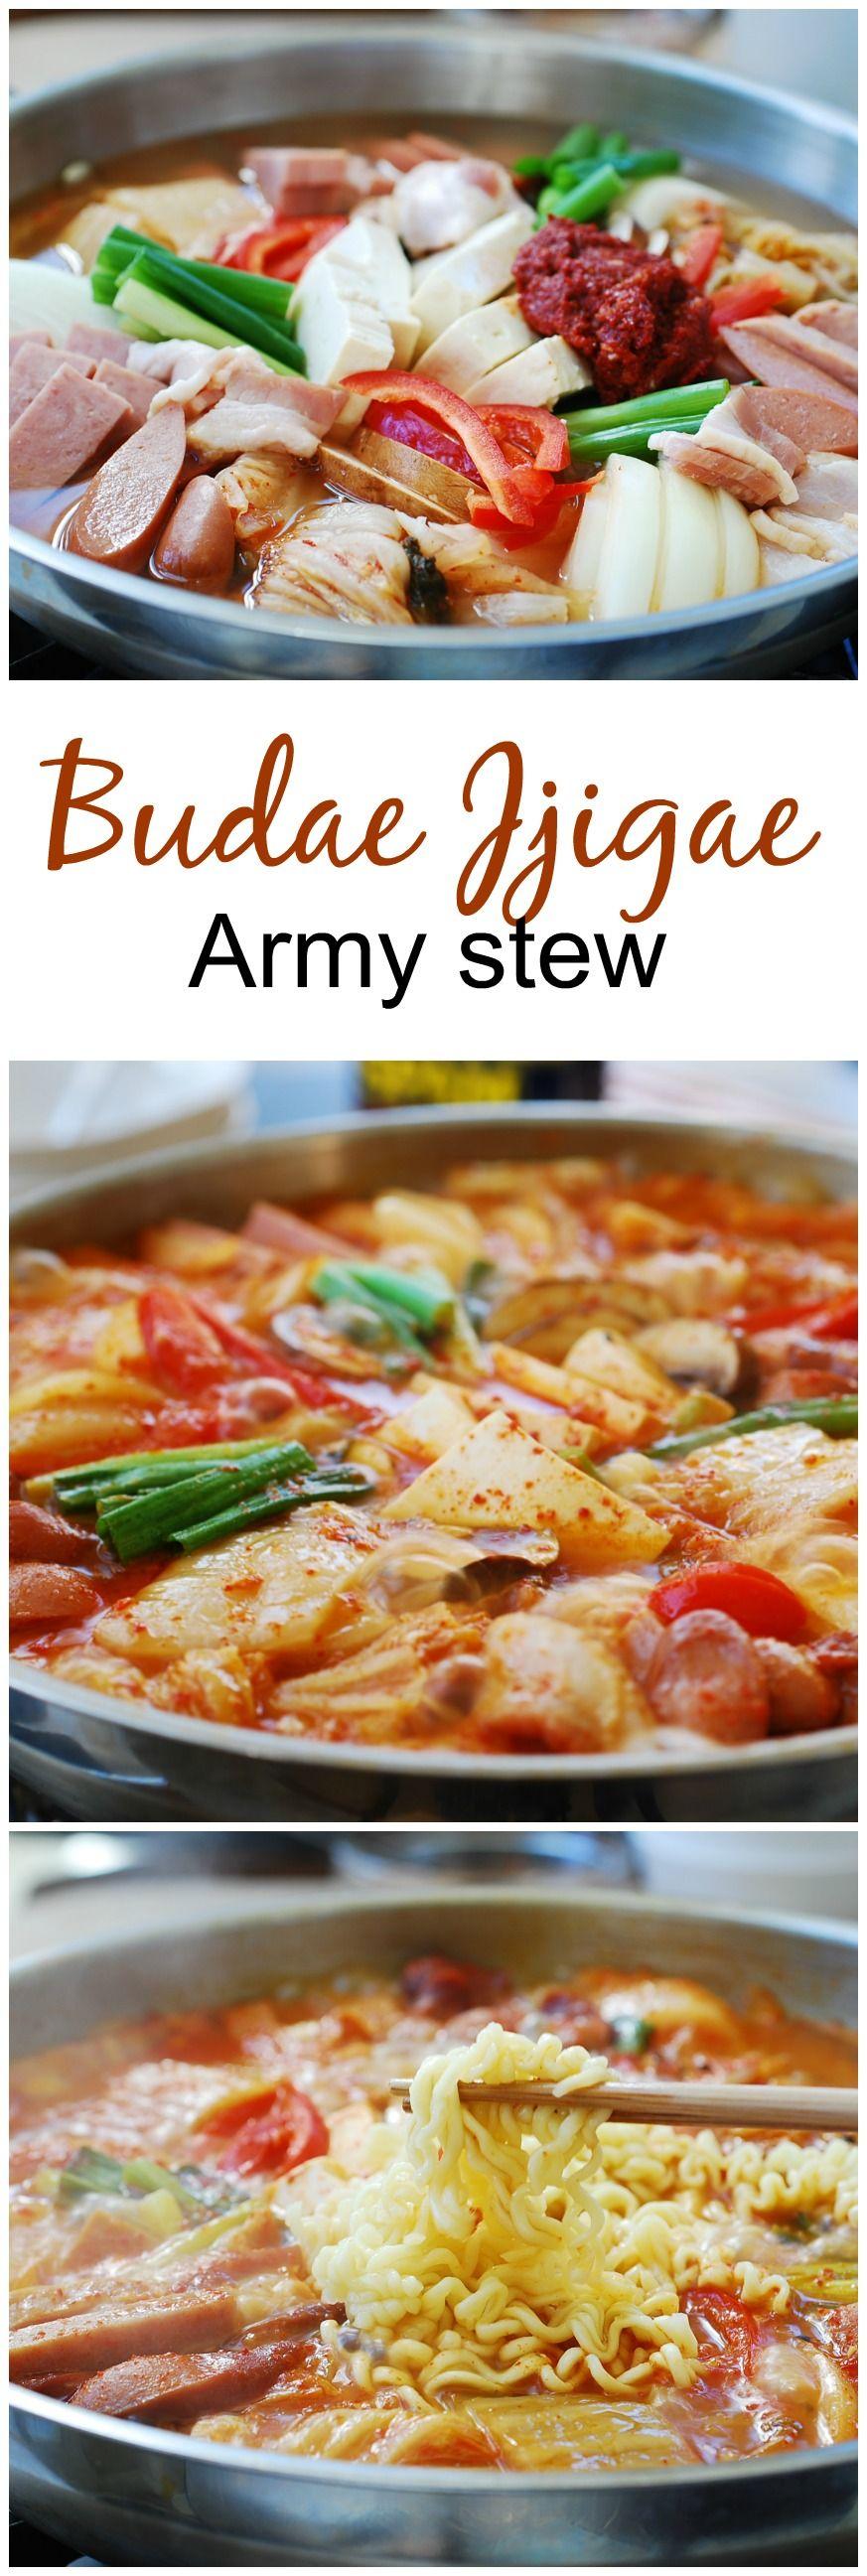 Budae Jjigae Army Stew Recipe Korea Korean Food Recipes